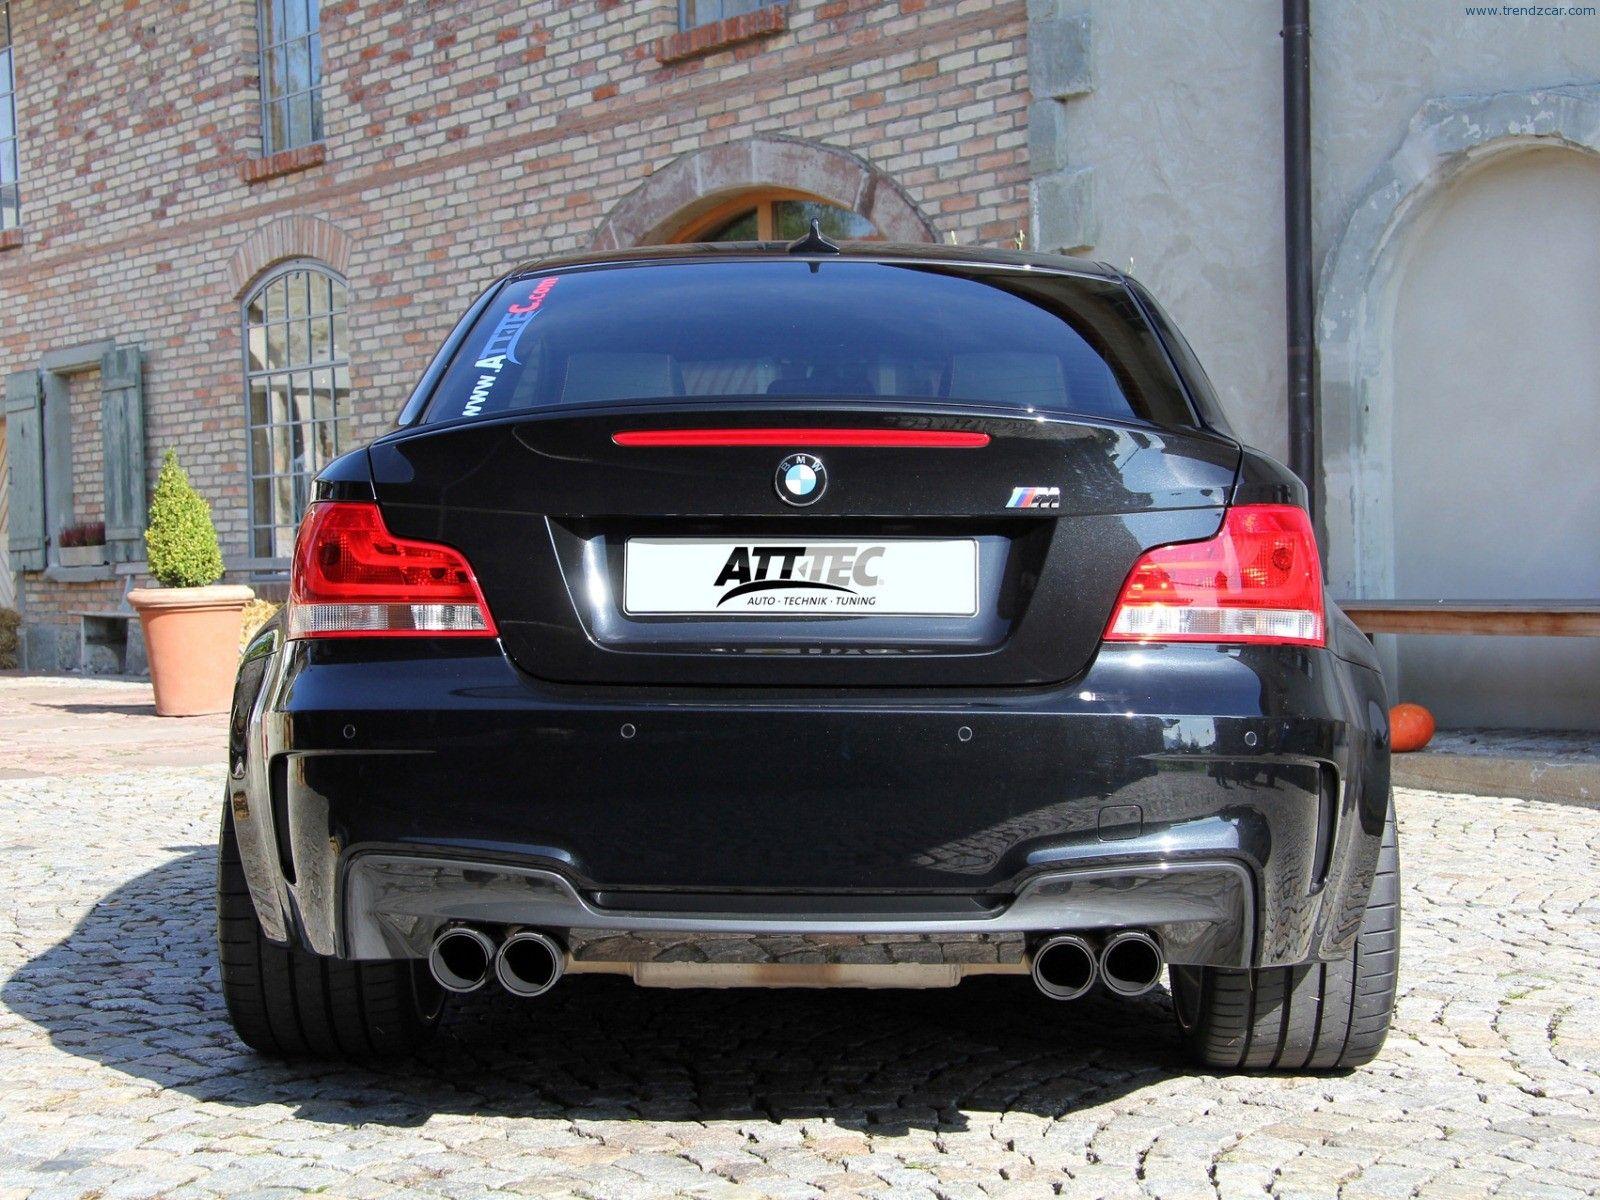 2012-ATT-TEC-BMW-1-Series-M-Coupe   BMW   Pinterest   BMW, Wheels ...